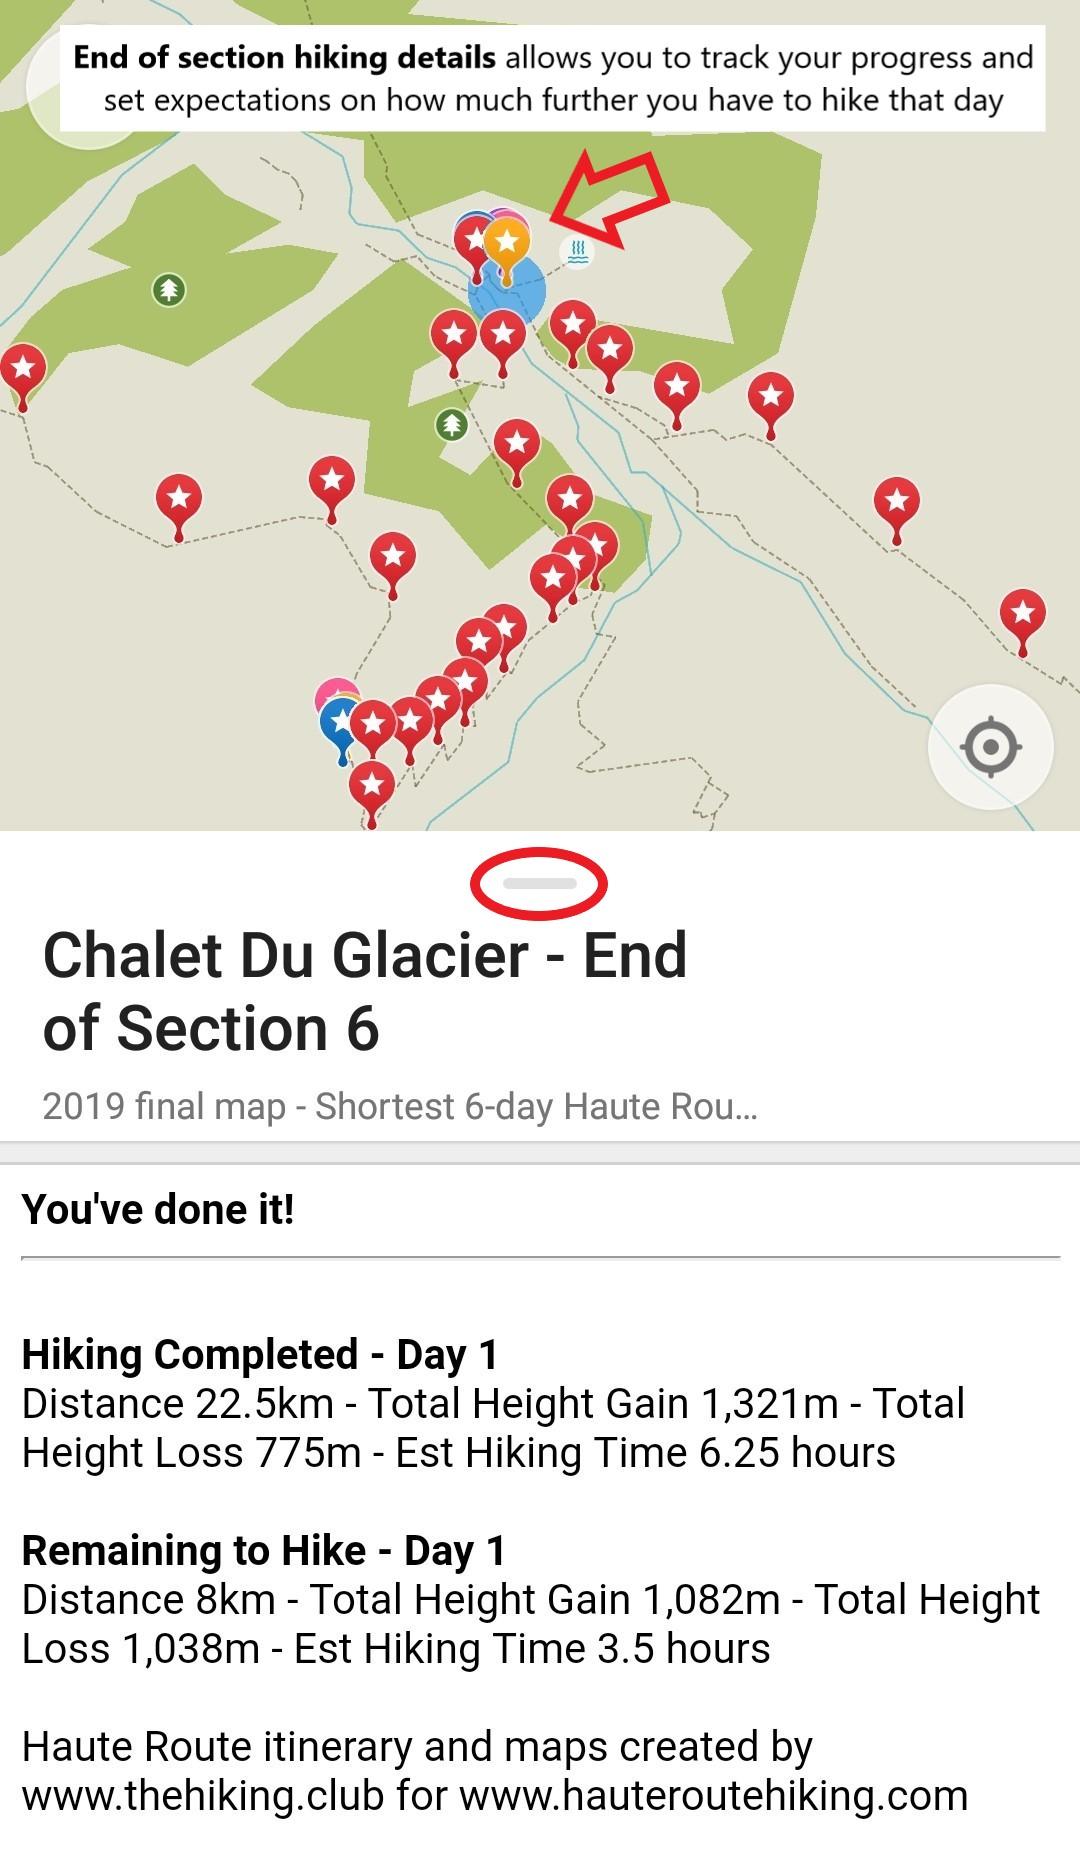 Walker's Haute Route sections